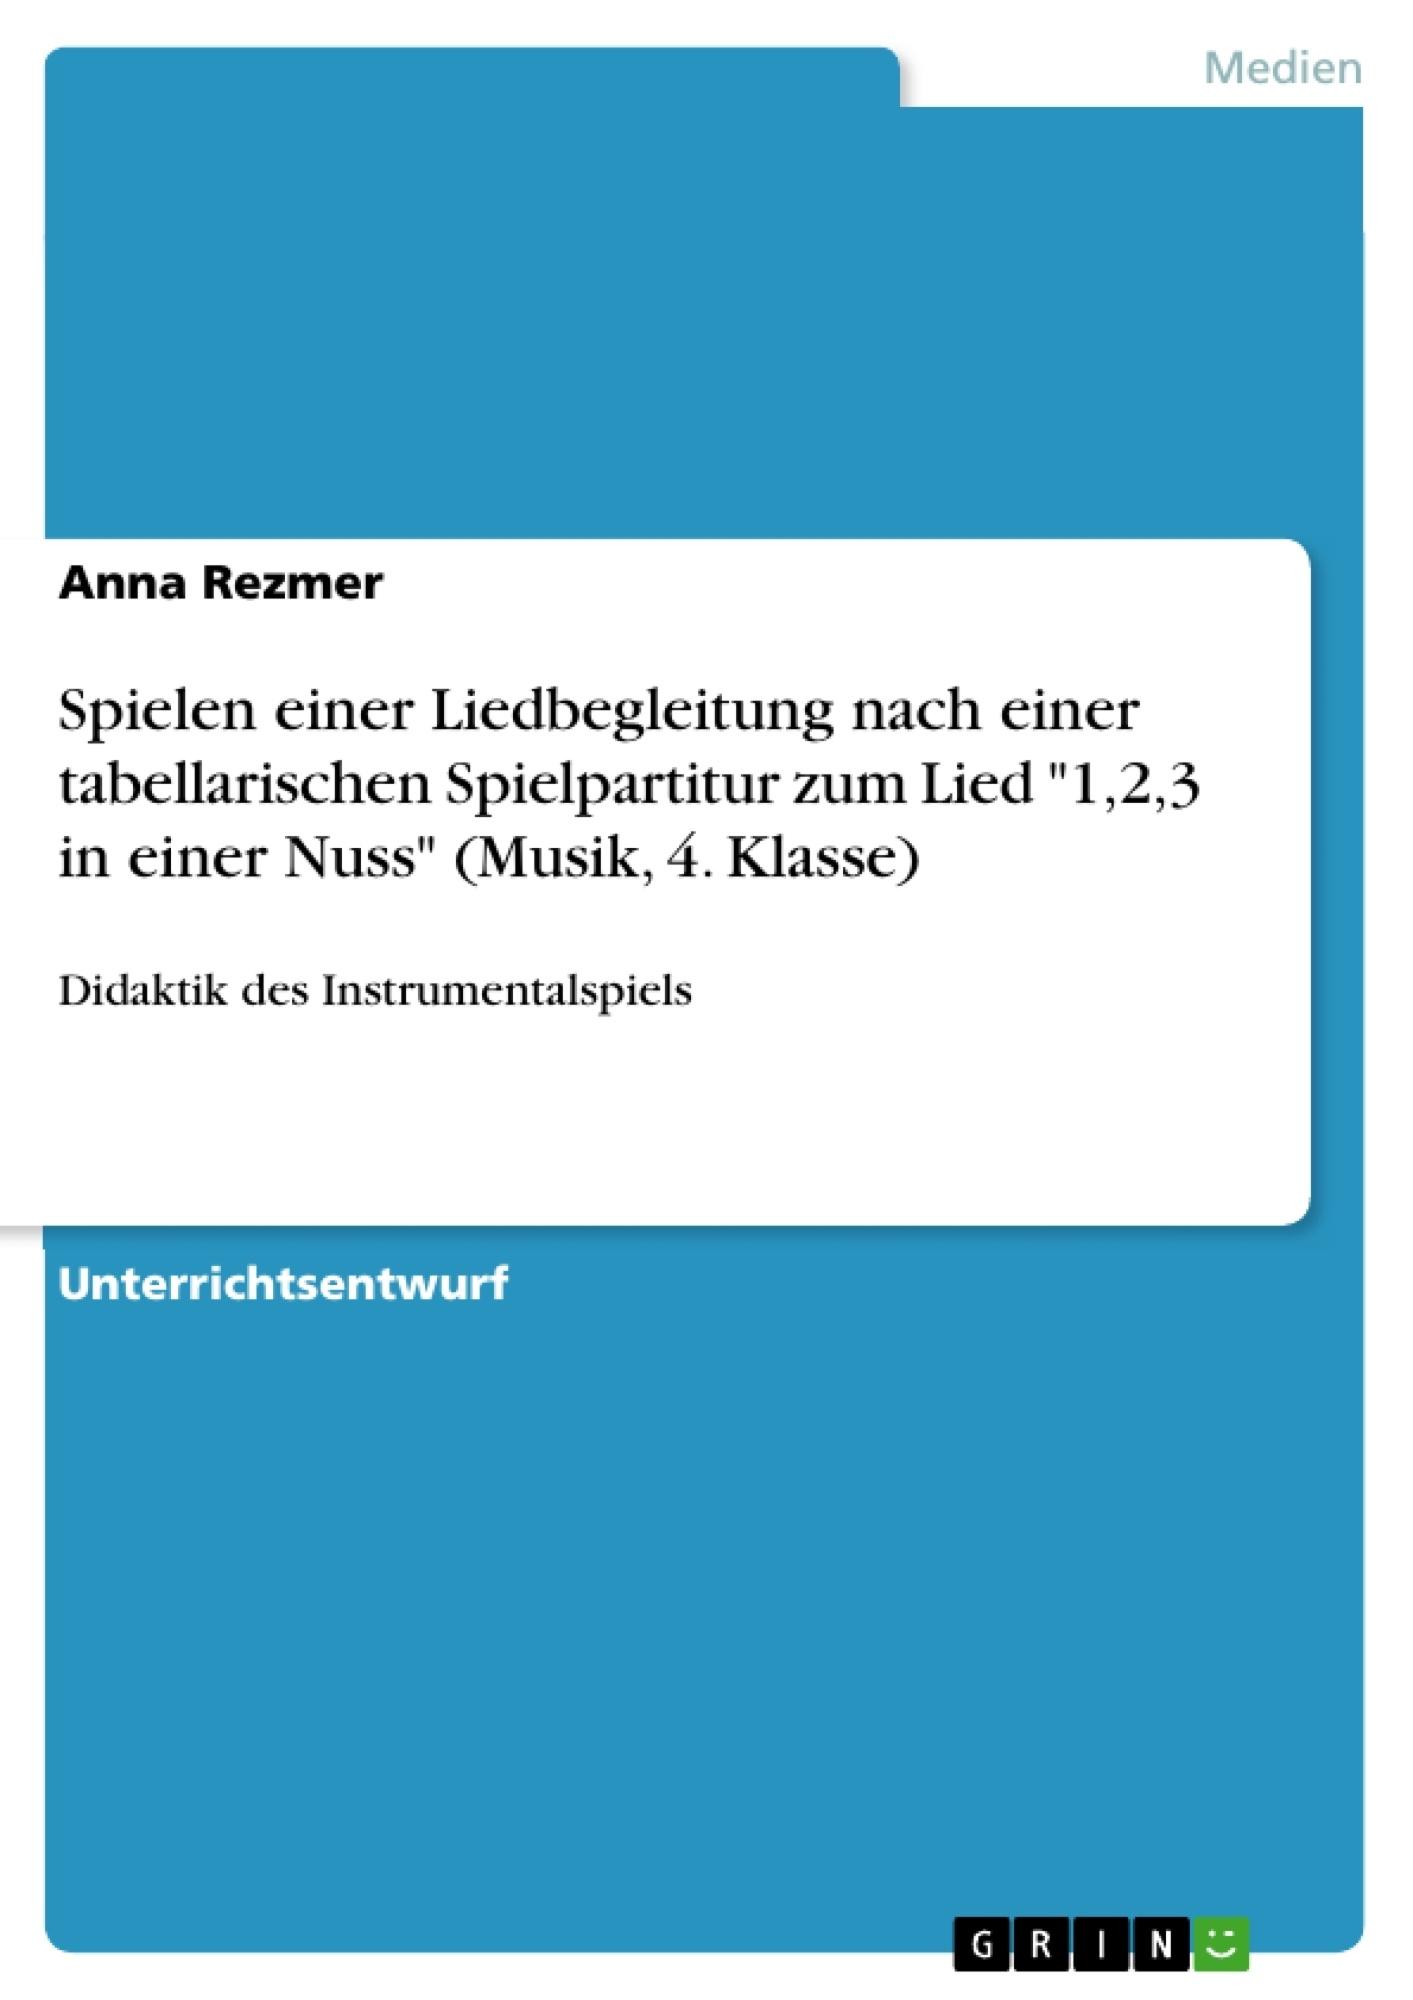 Beste 4Klasse Gemeinsamen Kern Mathe Arbeitsblatt Bilder - Super ...